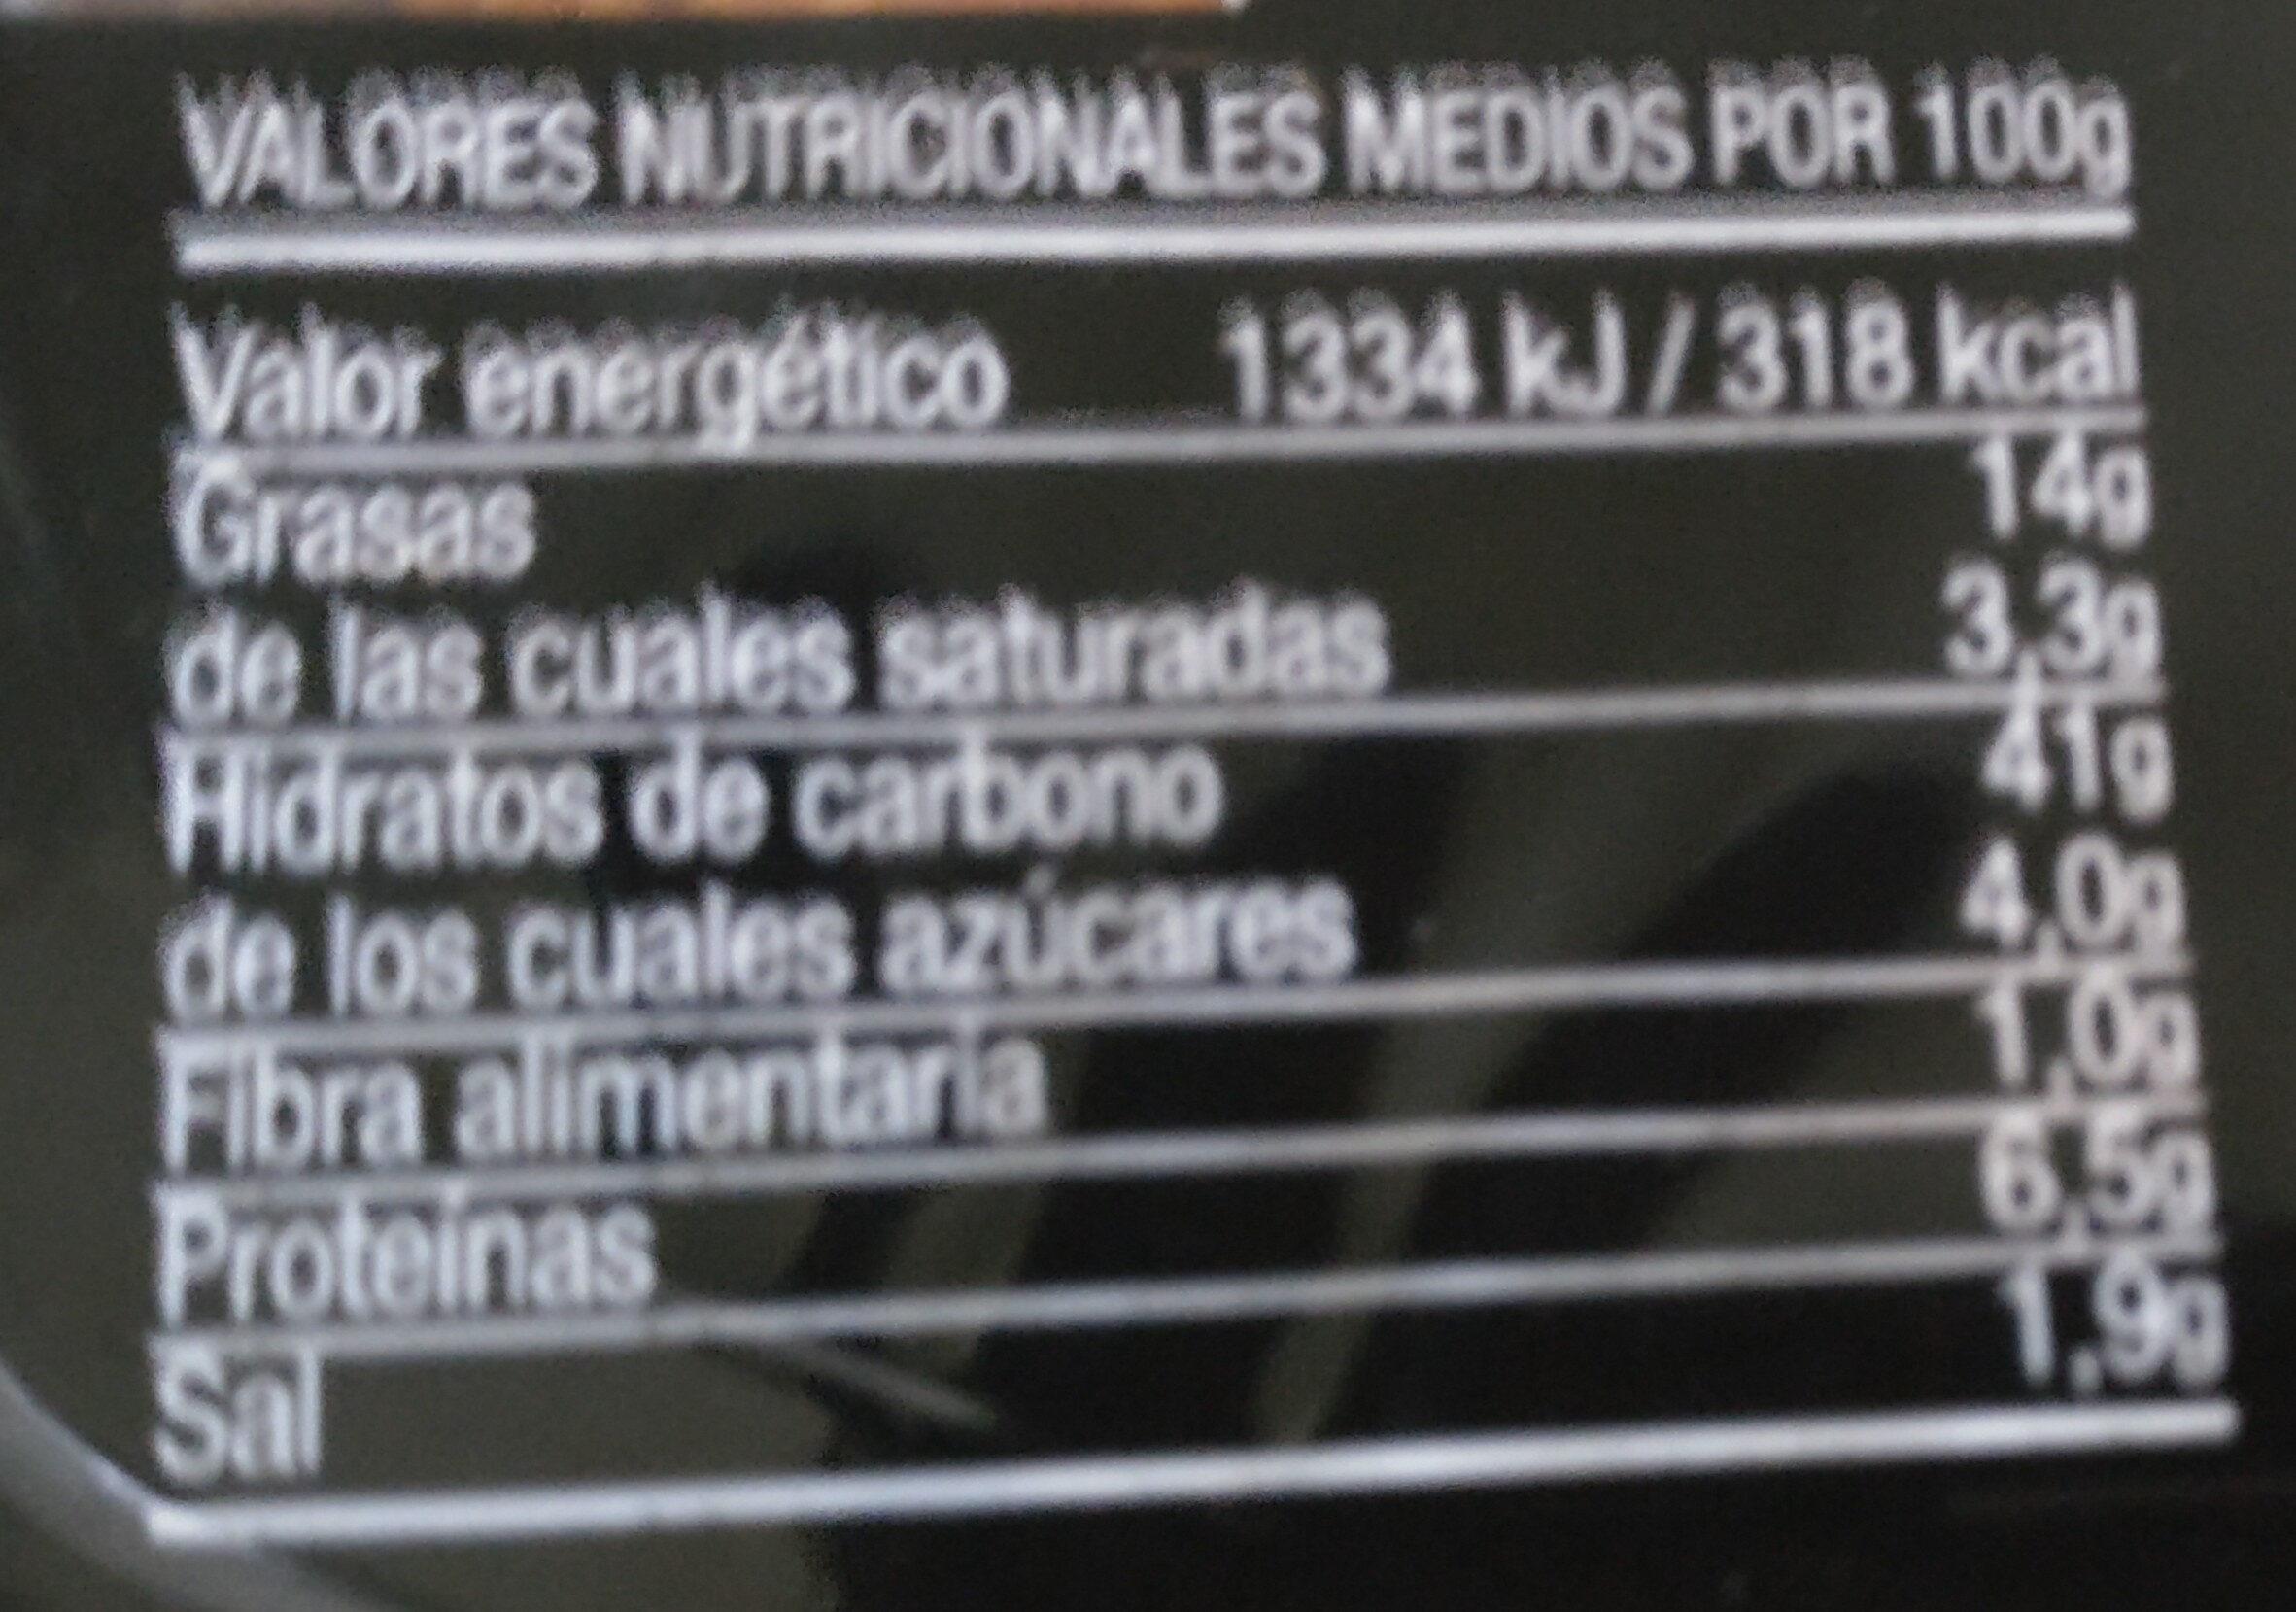 Migas con jamón - Informations nutritionnelles - es